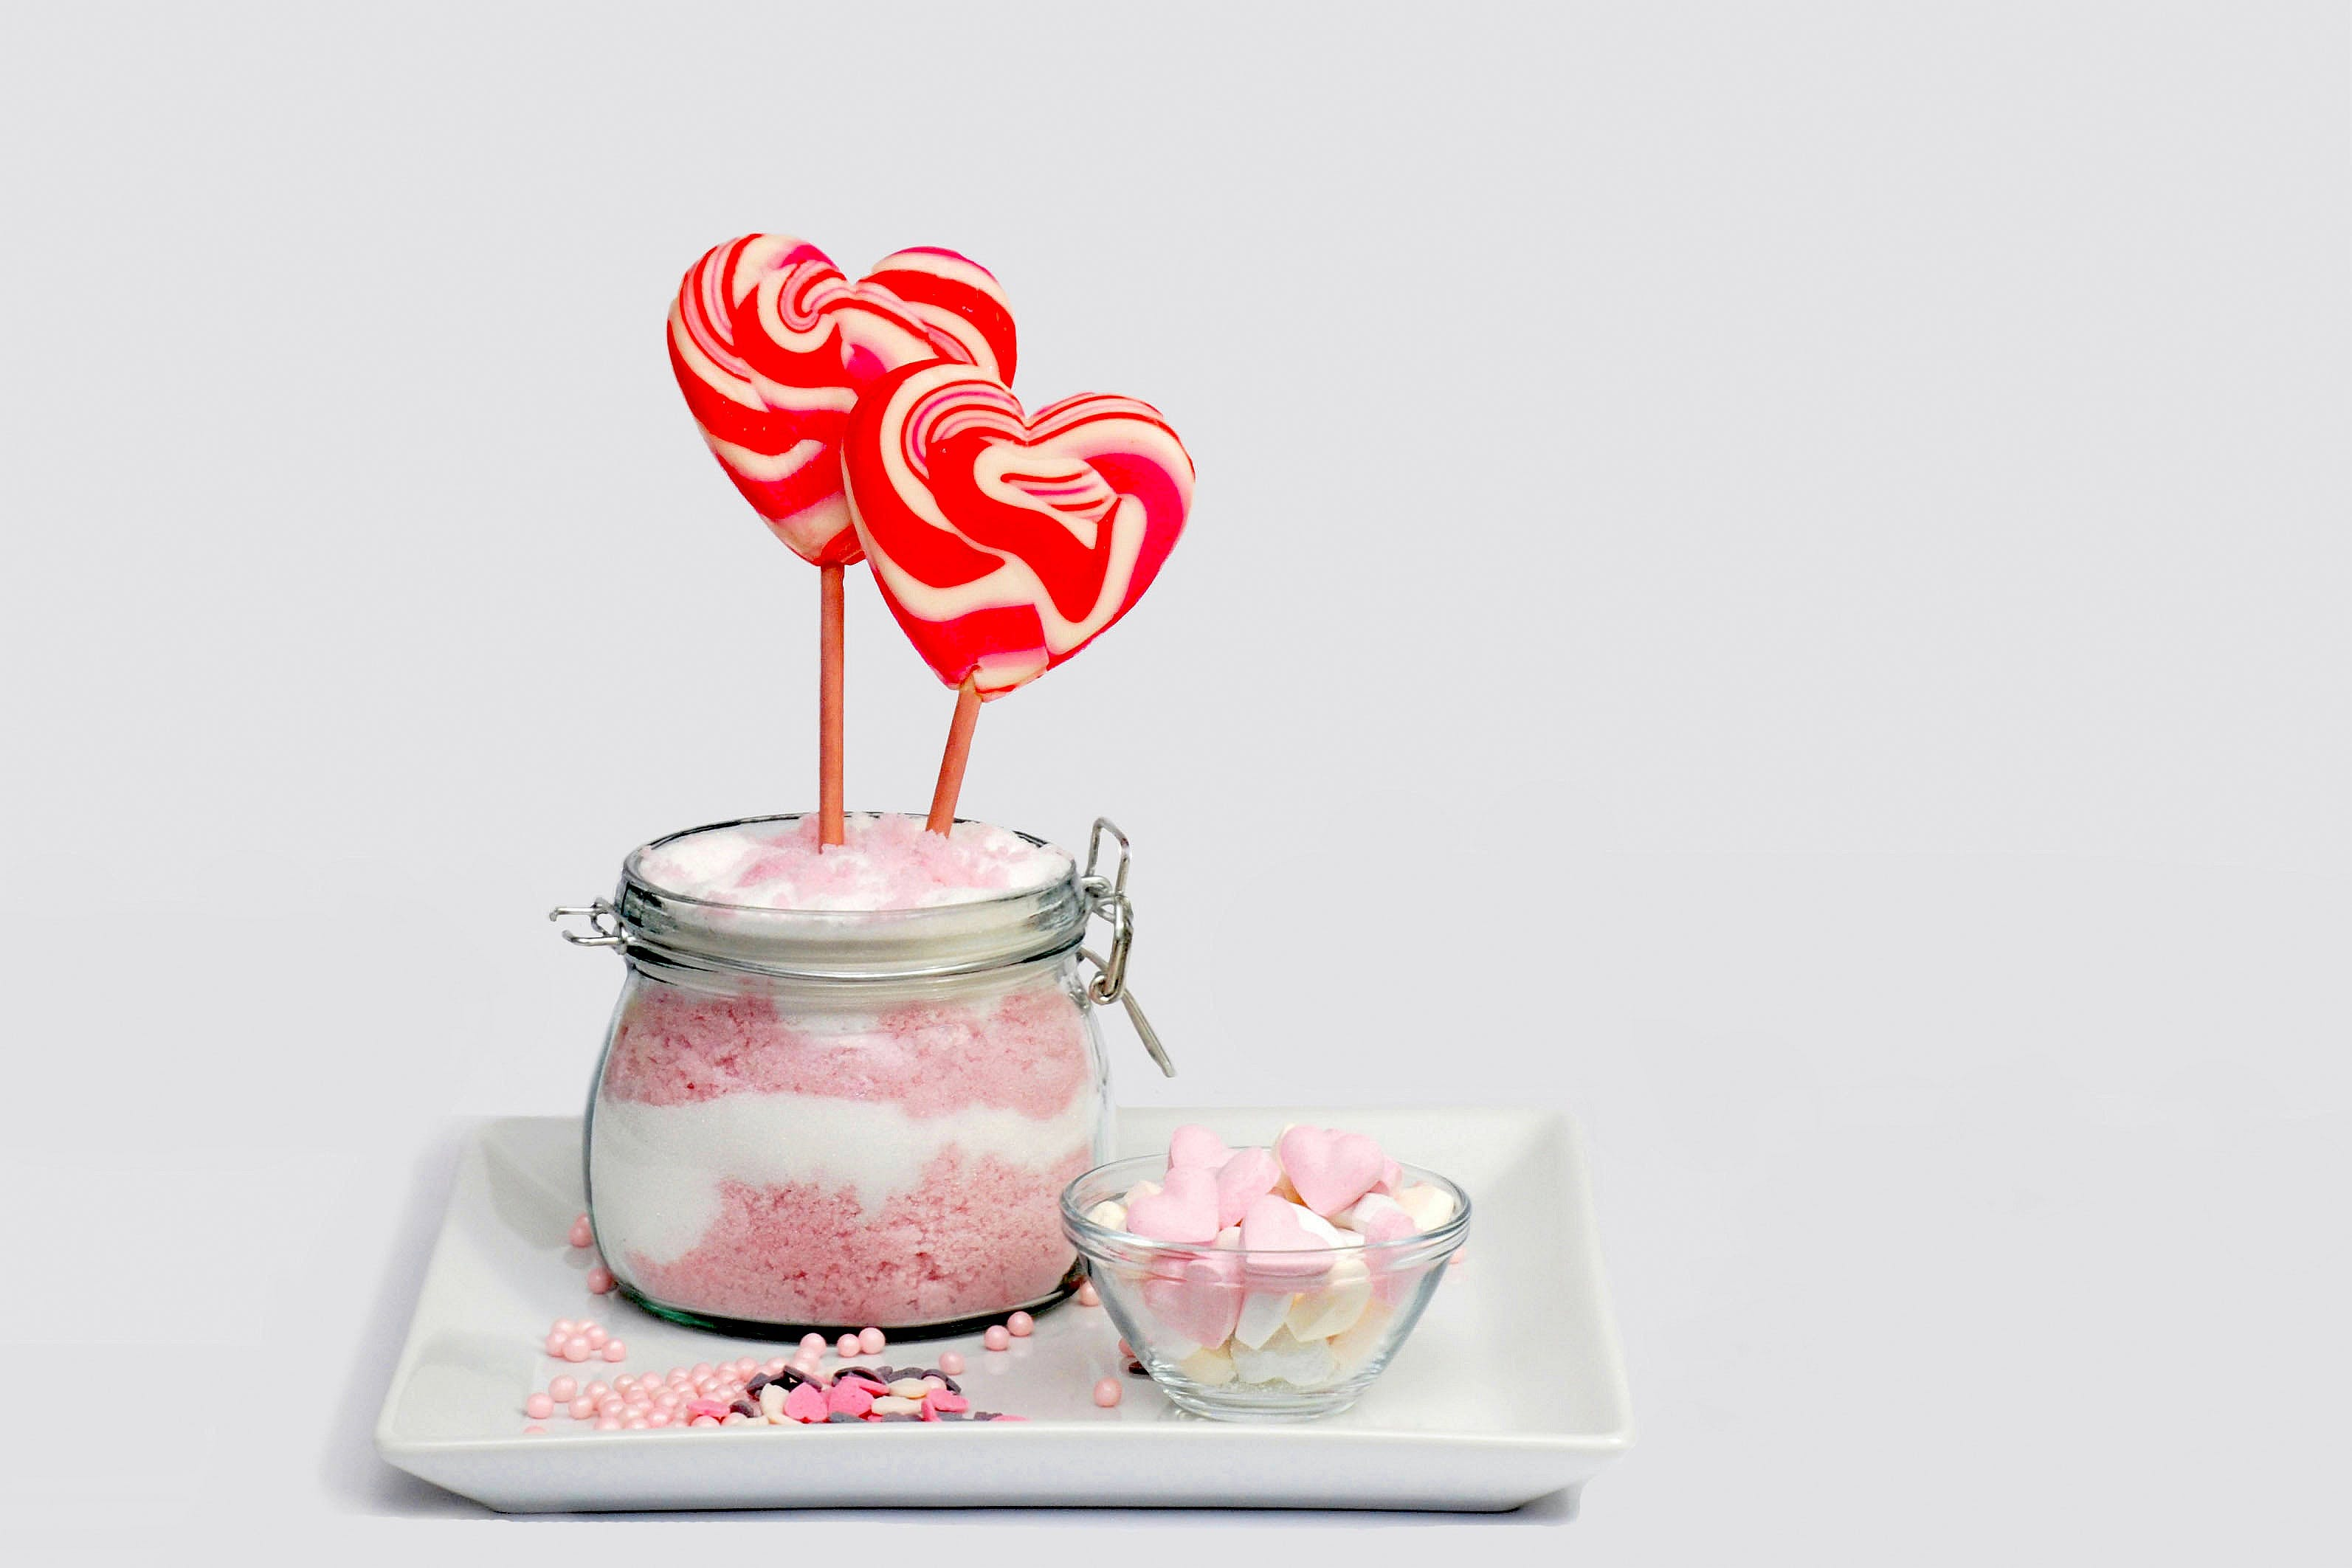 Gratis stockfoto met bord, eten, glazen pot, lolly